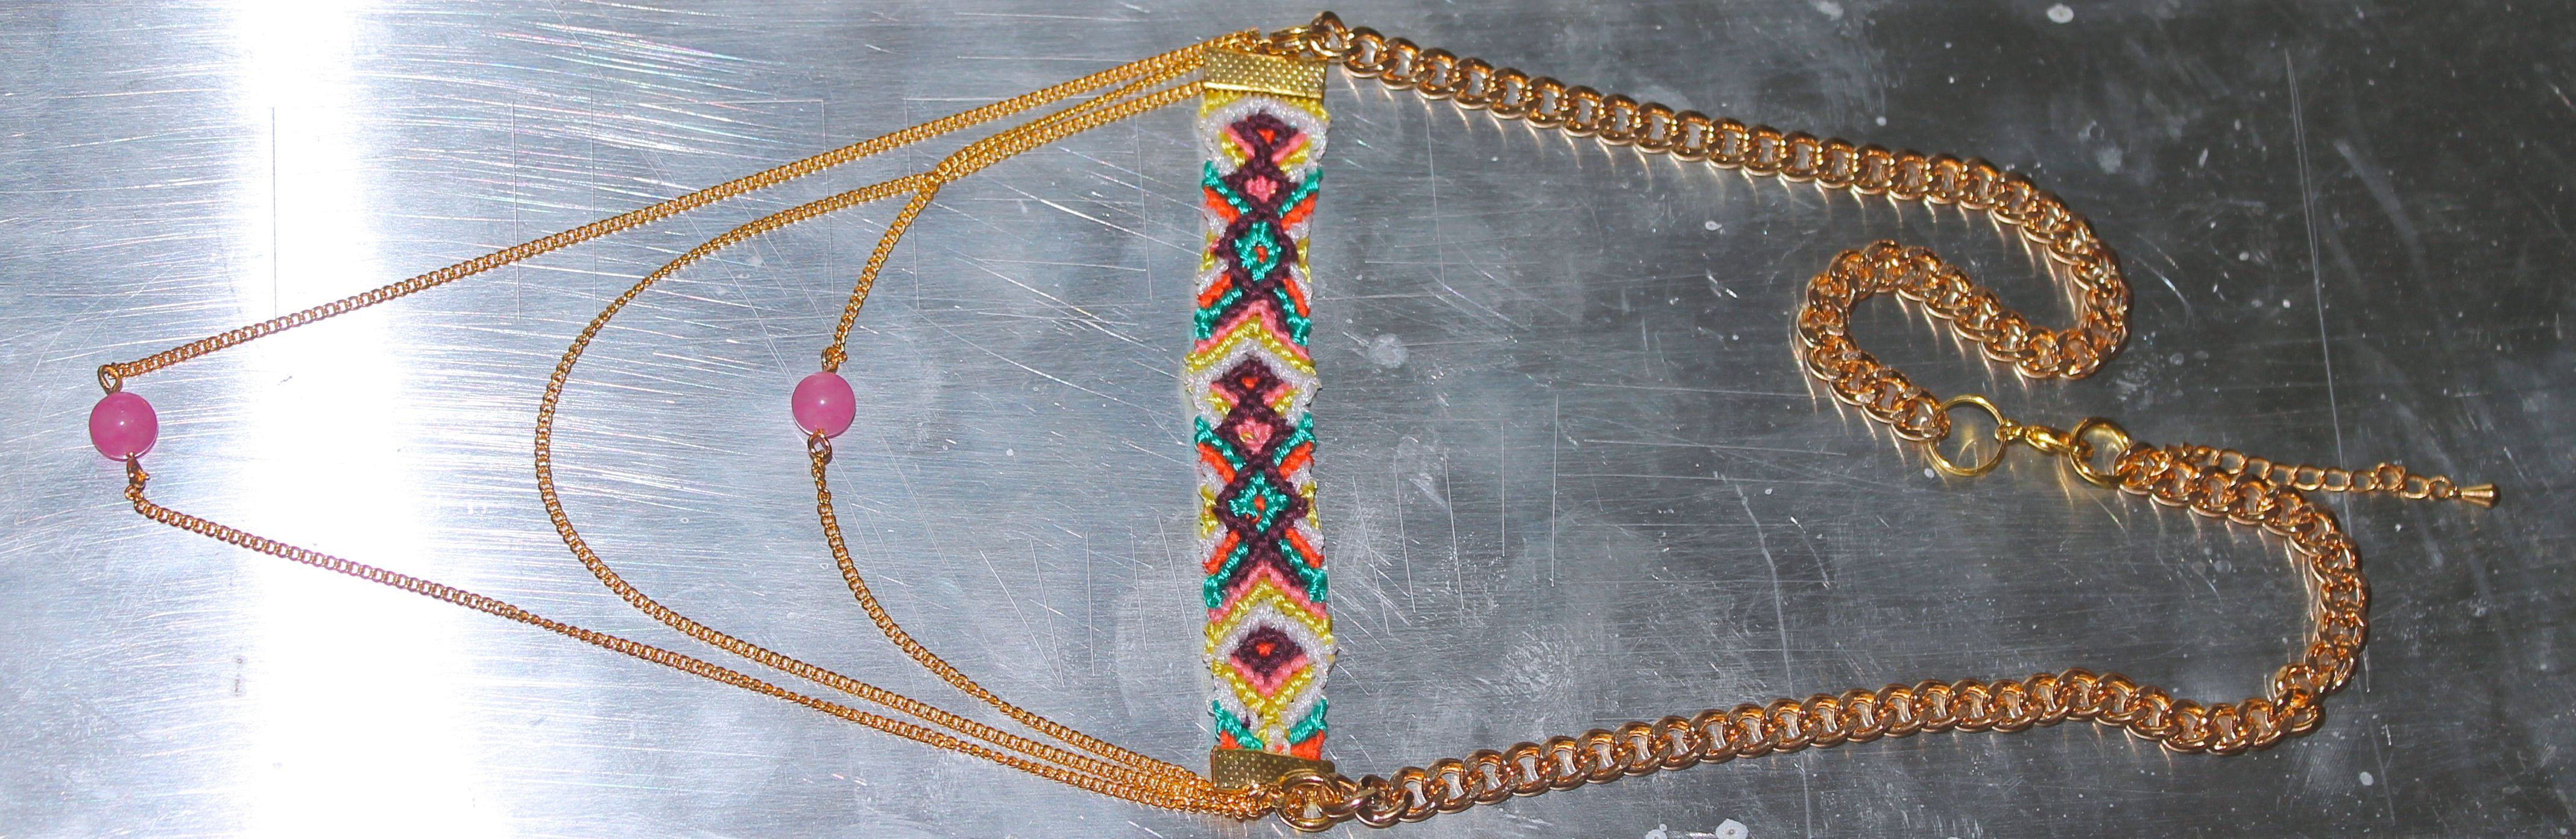 Summer is coming Ss15/16 #bbastet #brazil #collier #jewelery #bijou #fashionista #fashion #fashiondesigner #design #designers #jade